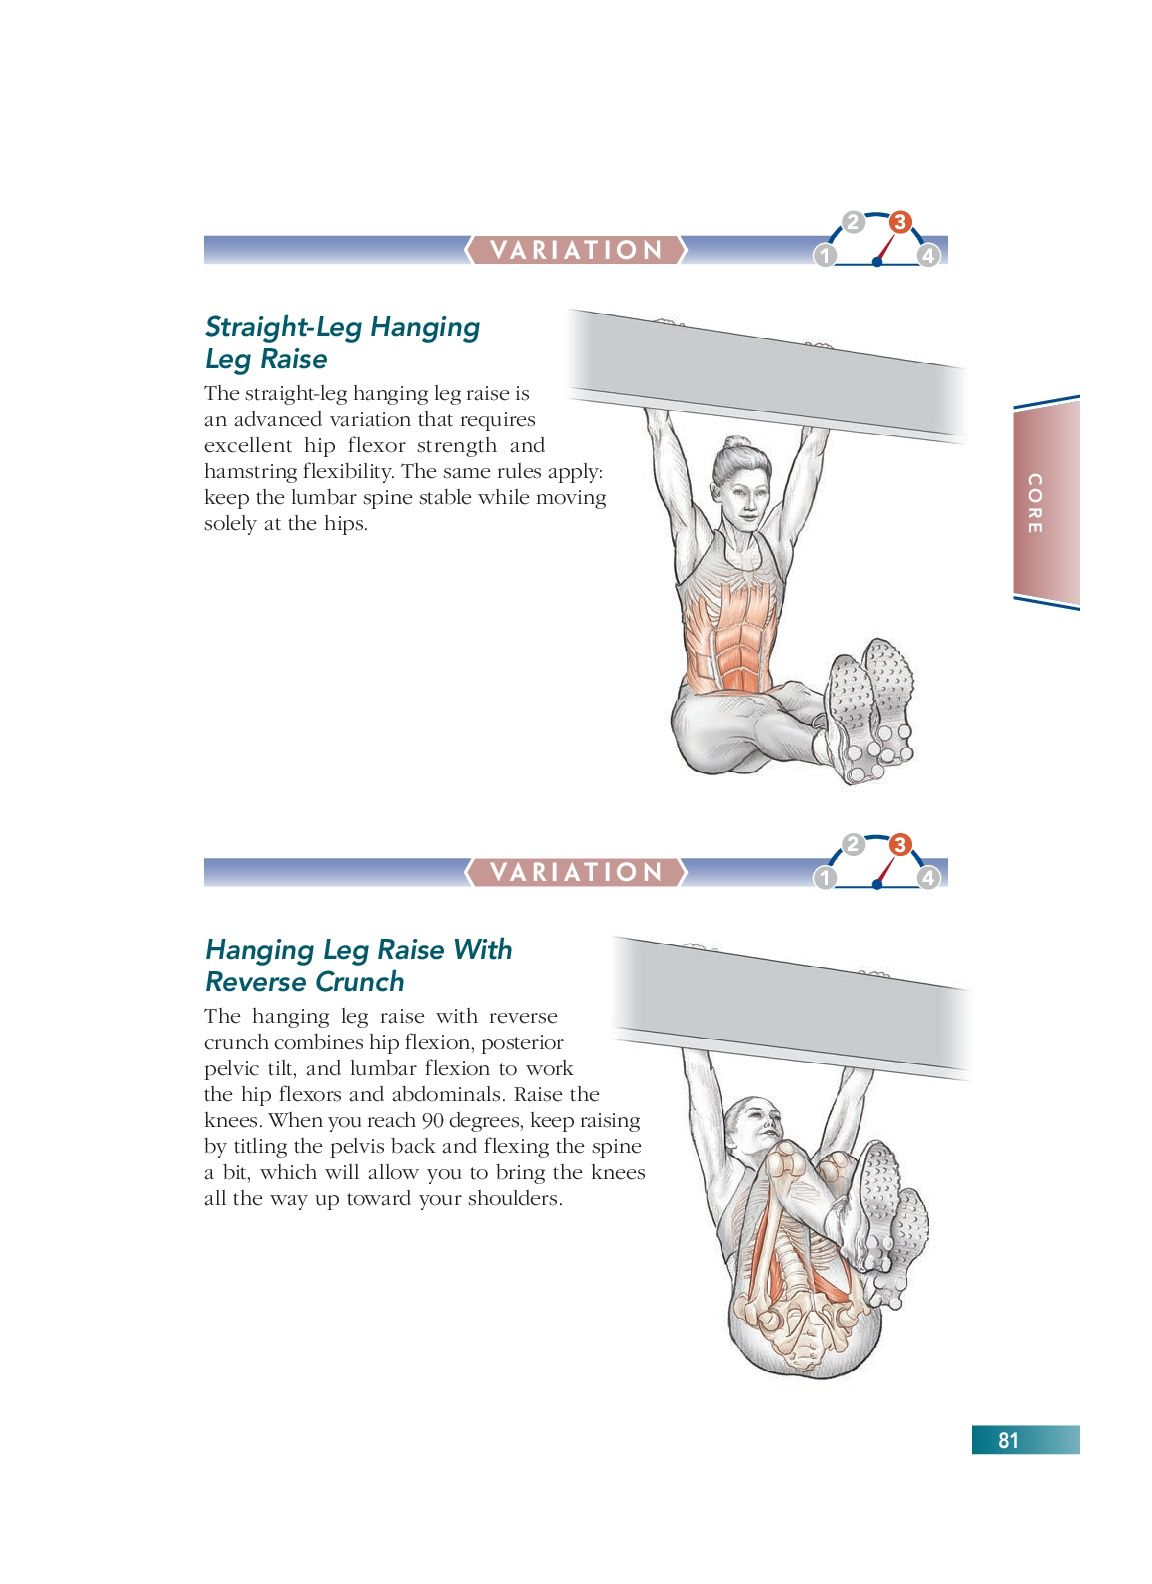 Chapter 5 Core 81 Bodyweight Strength Training Anatomy Pinterest